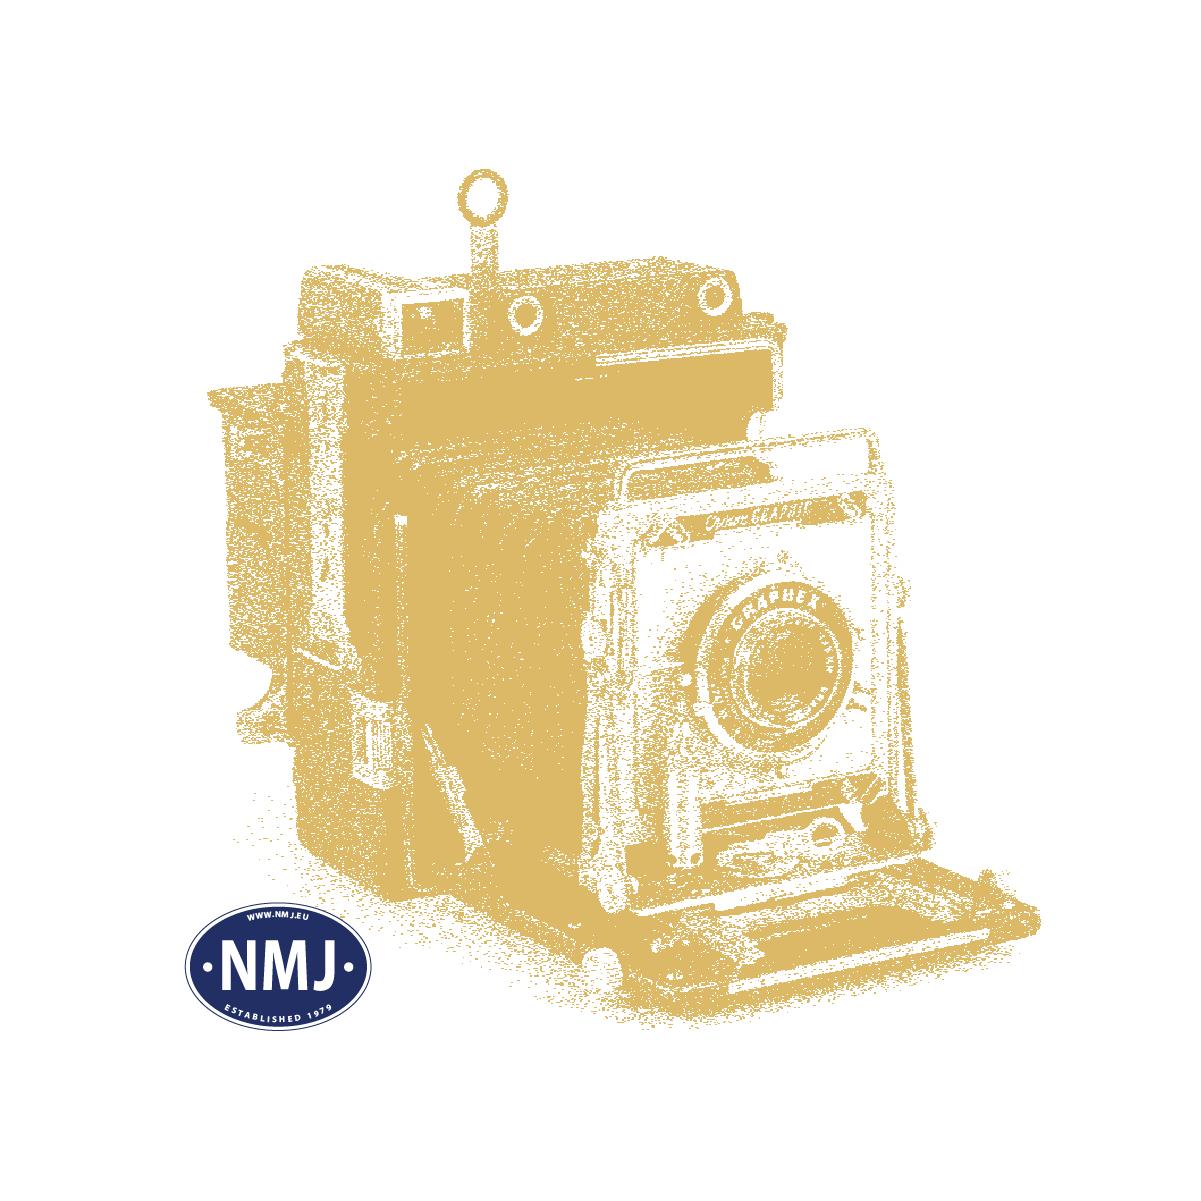 NMJ Topline NSB Di3.623 Gammeldesign, 0-Skala